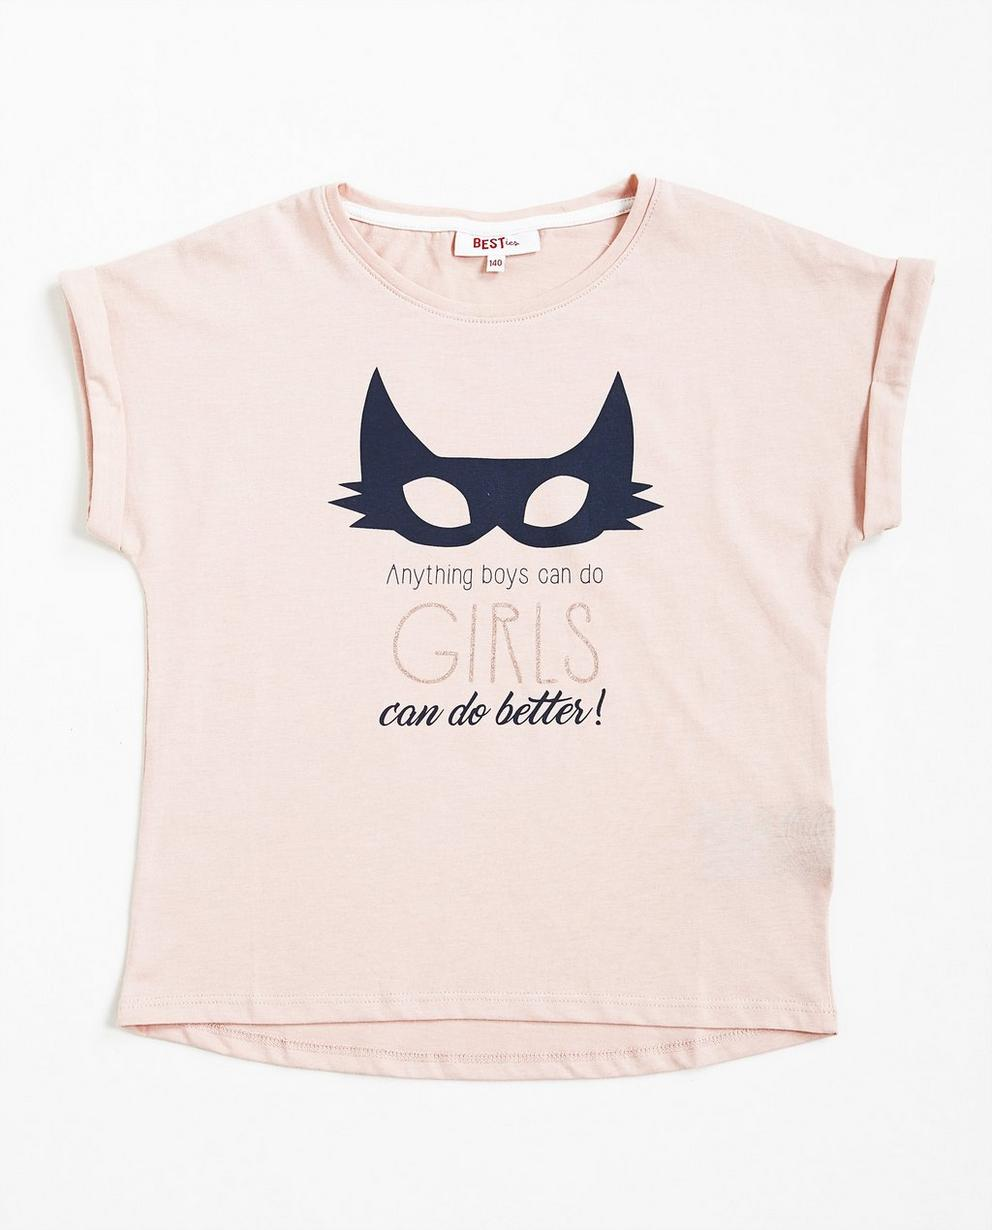 T-shirt avec imprimé - gris clair, BESTies - Besties